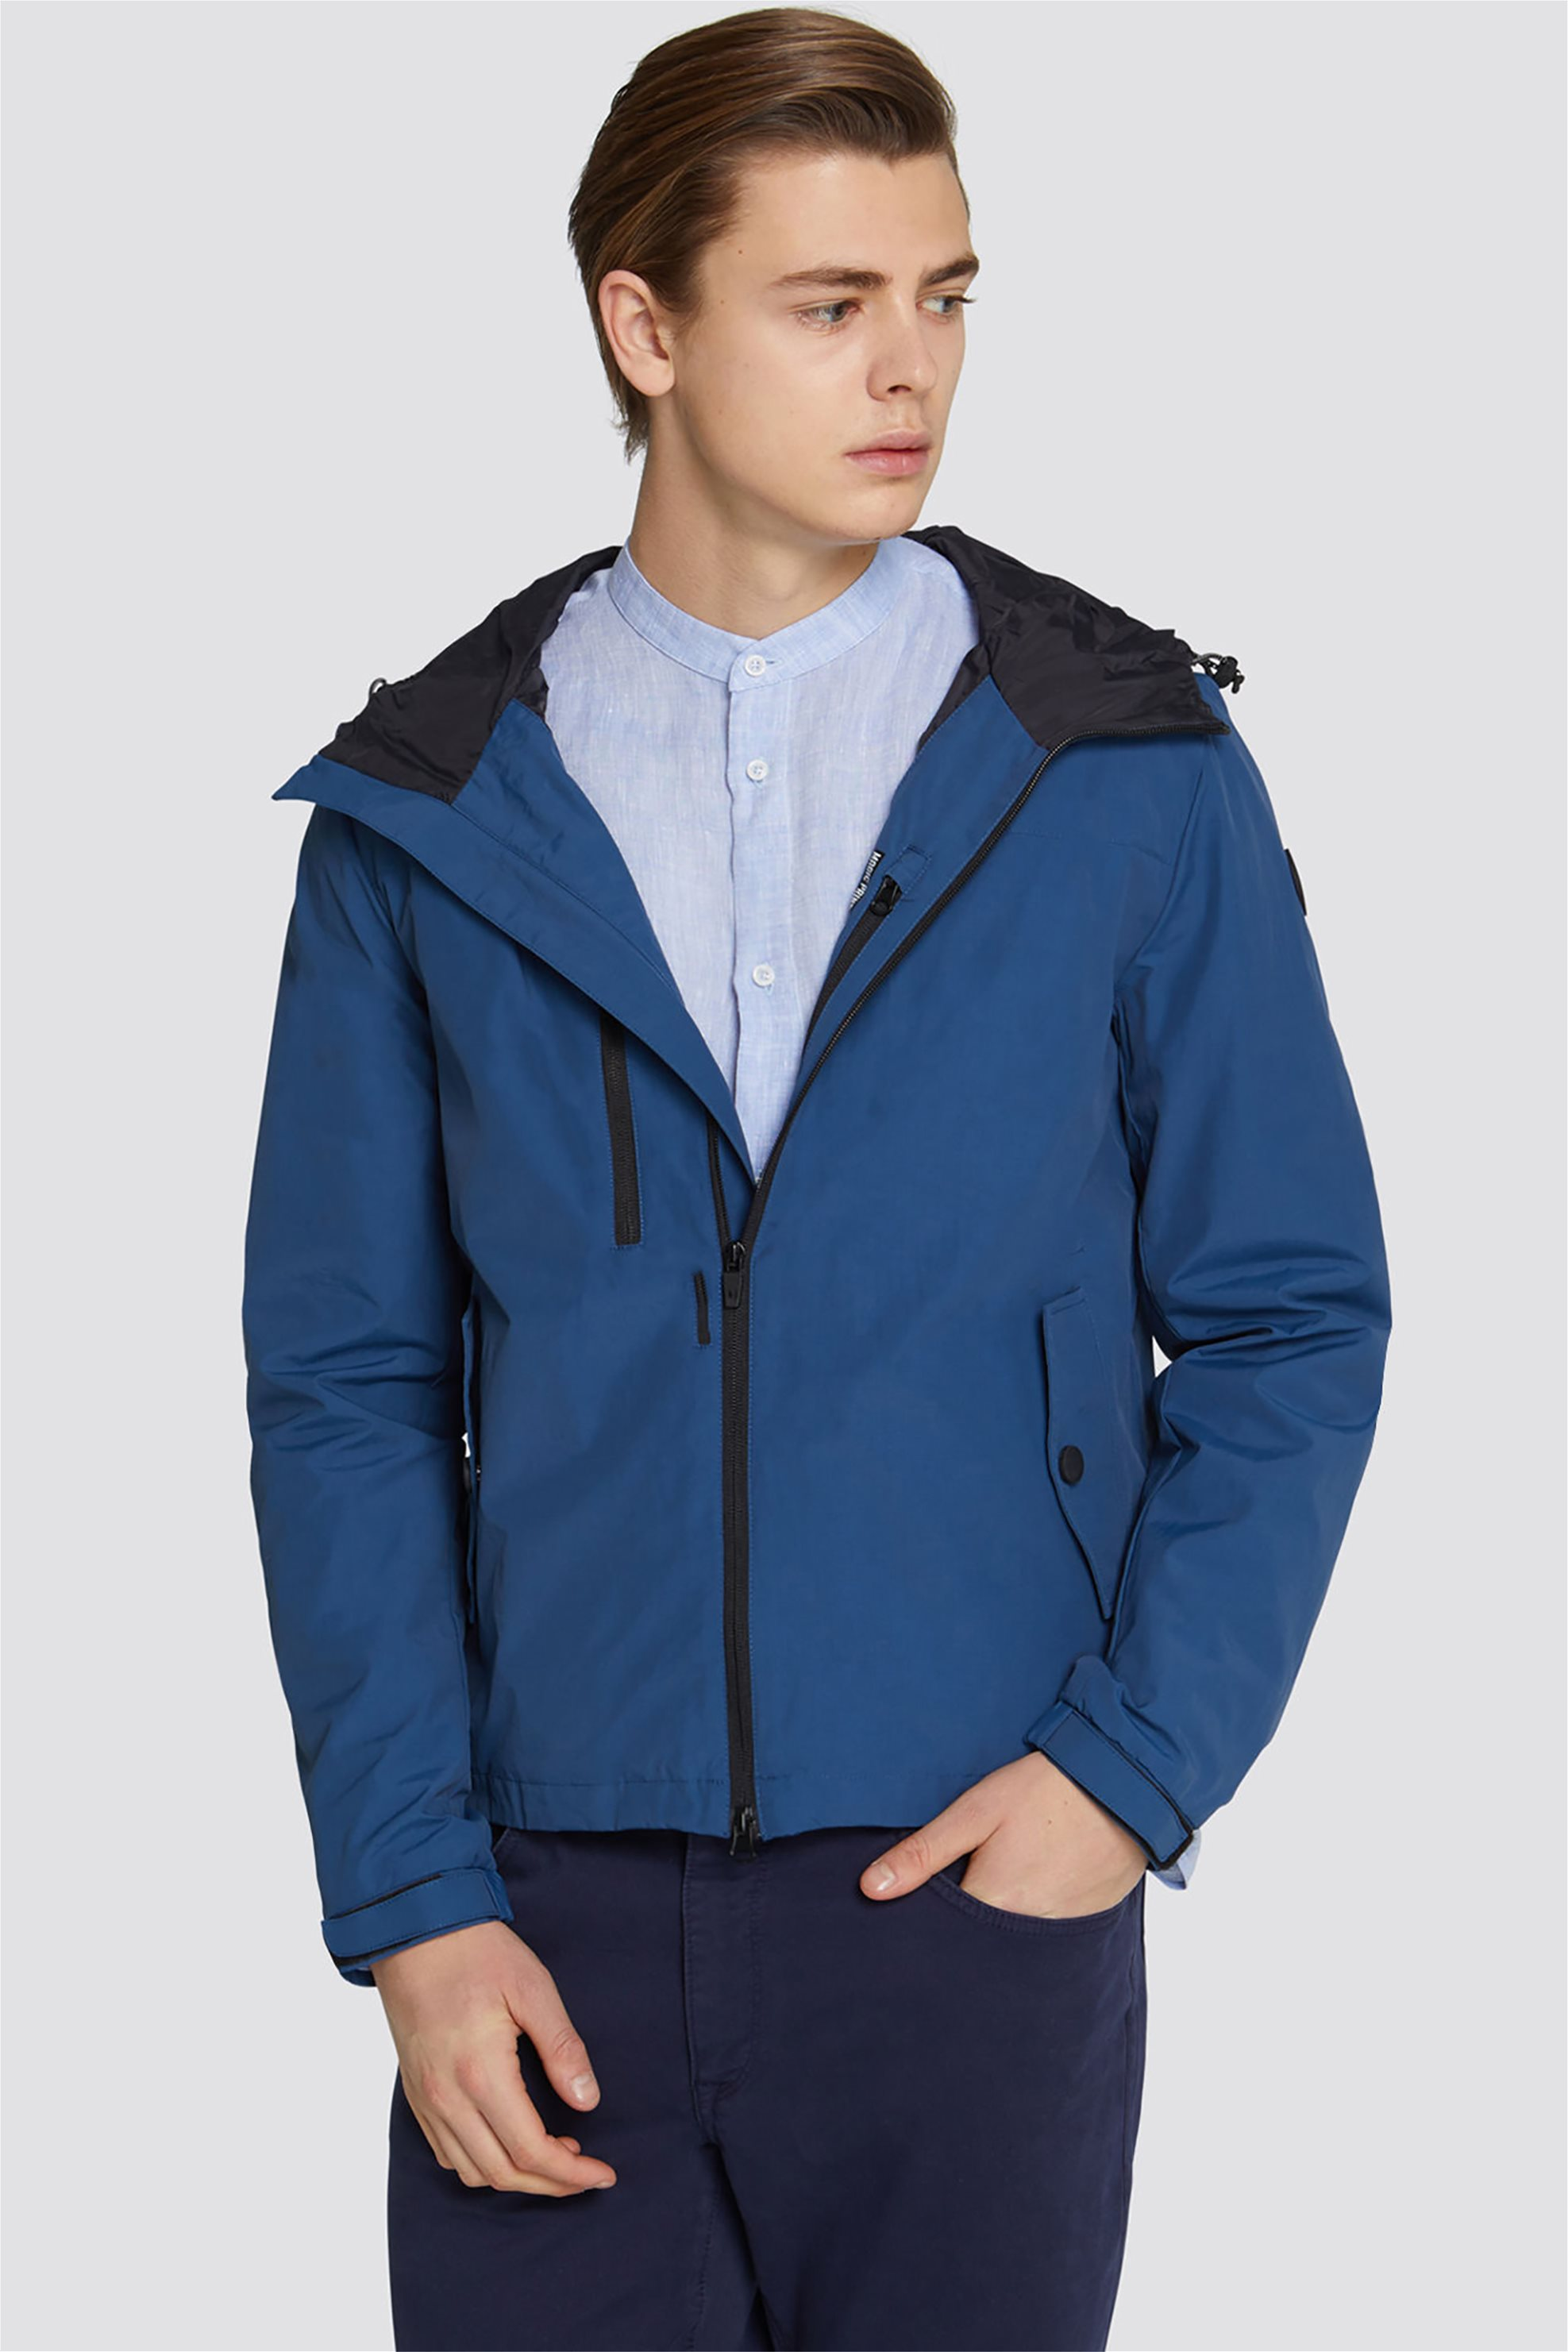 a21a39a4d7 Trussardi Jeans ανδρικό αδιάβροχο μπουφάν με κουκούλα - 52S00277-1T002158 -  Μπλε Σκούρο